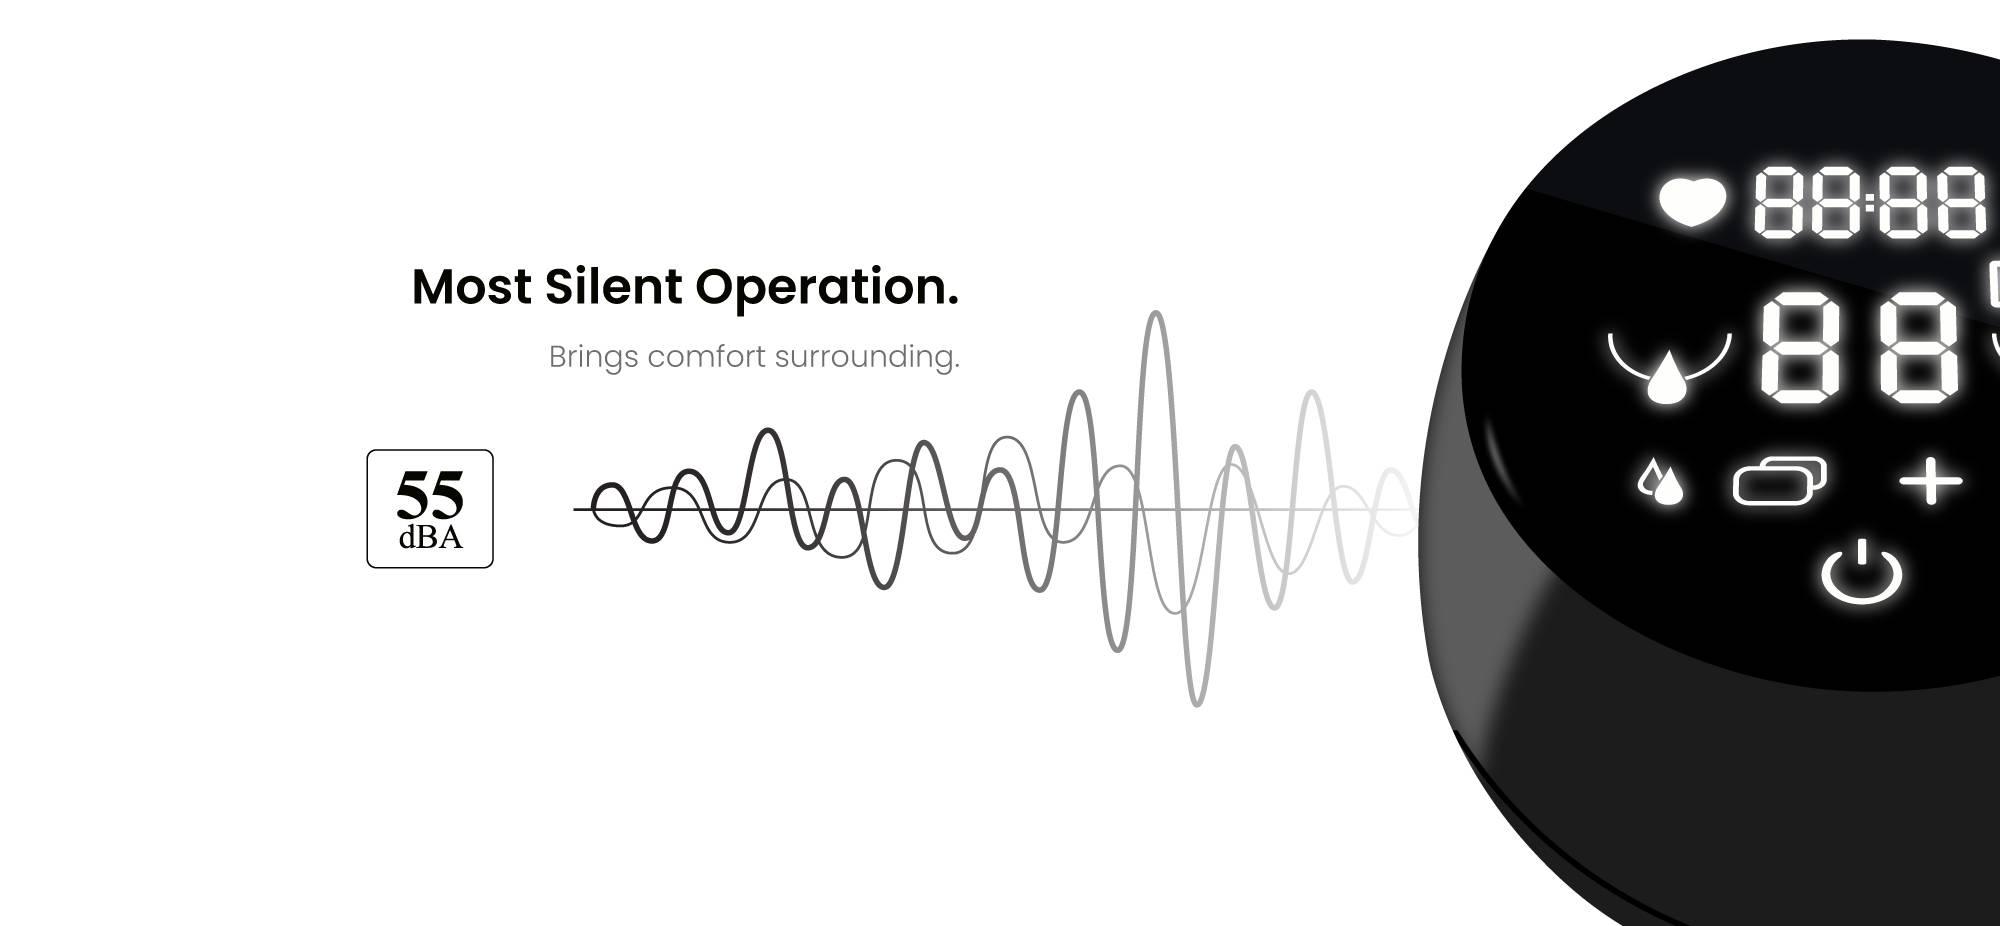 Silent operation